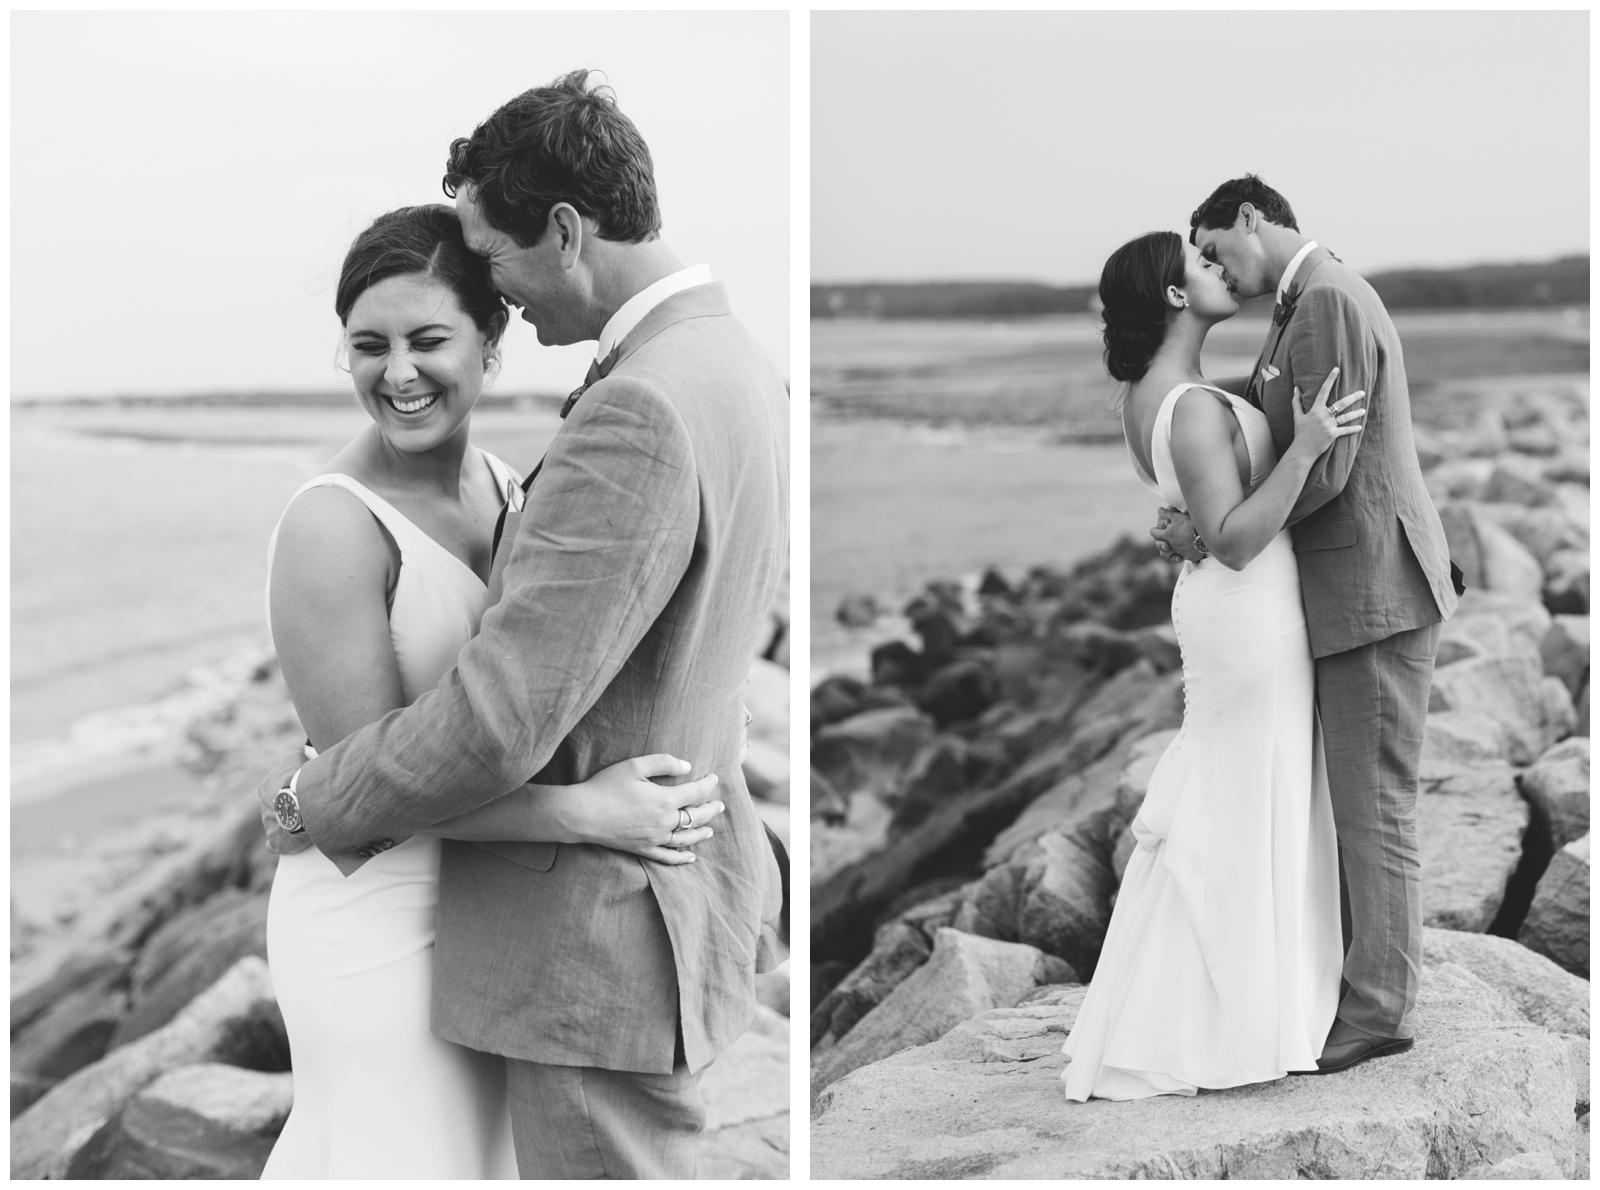 Bailey-Q-Photo-Backyard-Wedding-South-Shore-Boston-Wedding-Photographer-106.jpg